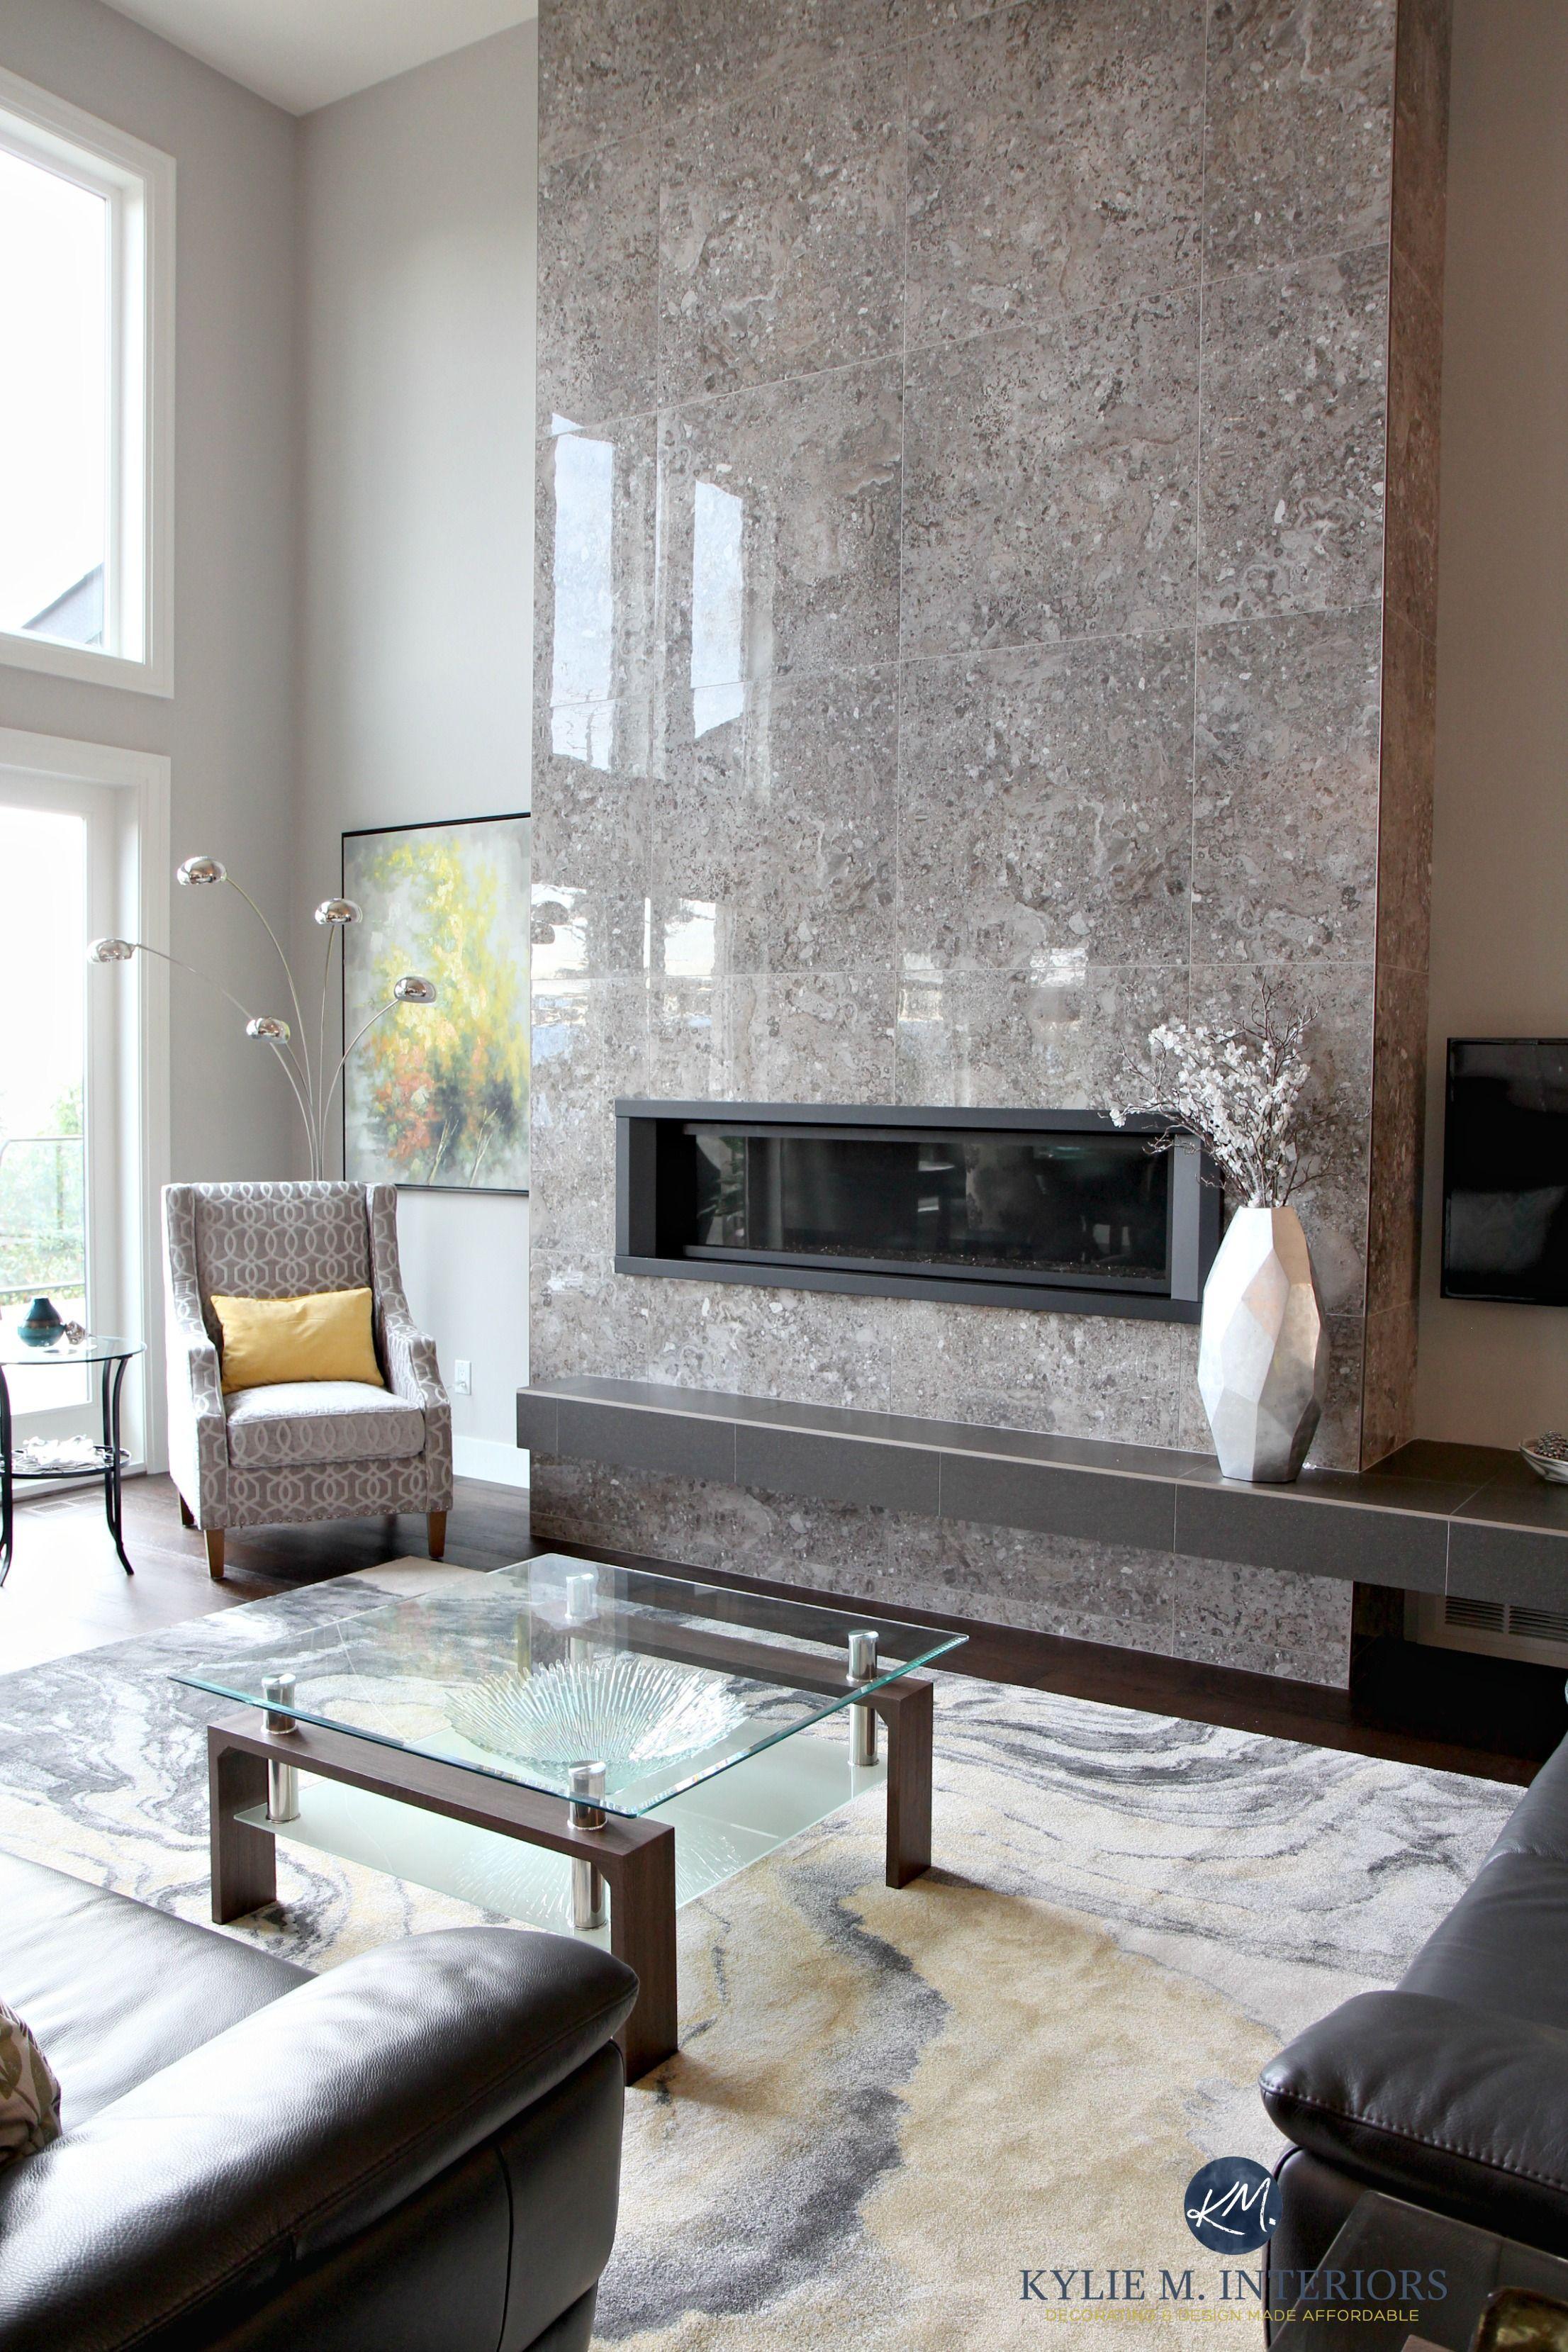 3 Mind Blowing Unique Ideas Contemporary Minimalist Tile Contemporary Reception Projects Cont Modern Fireplace Contemporary Fireplace Designs Fireplace Design